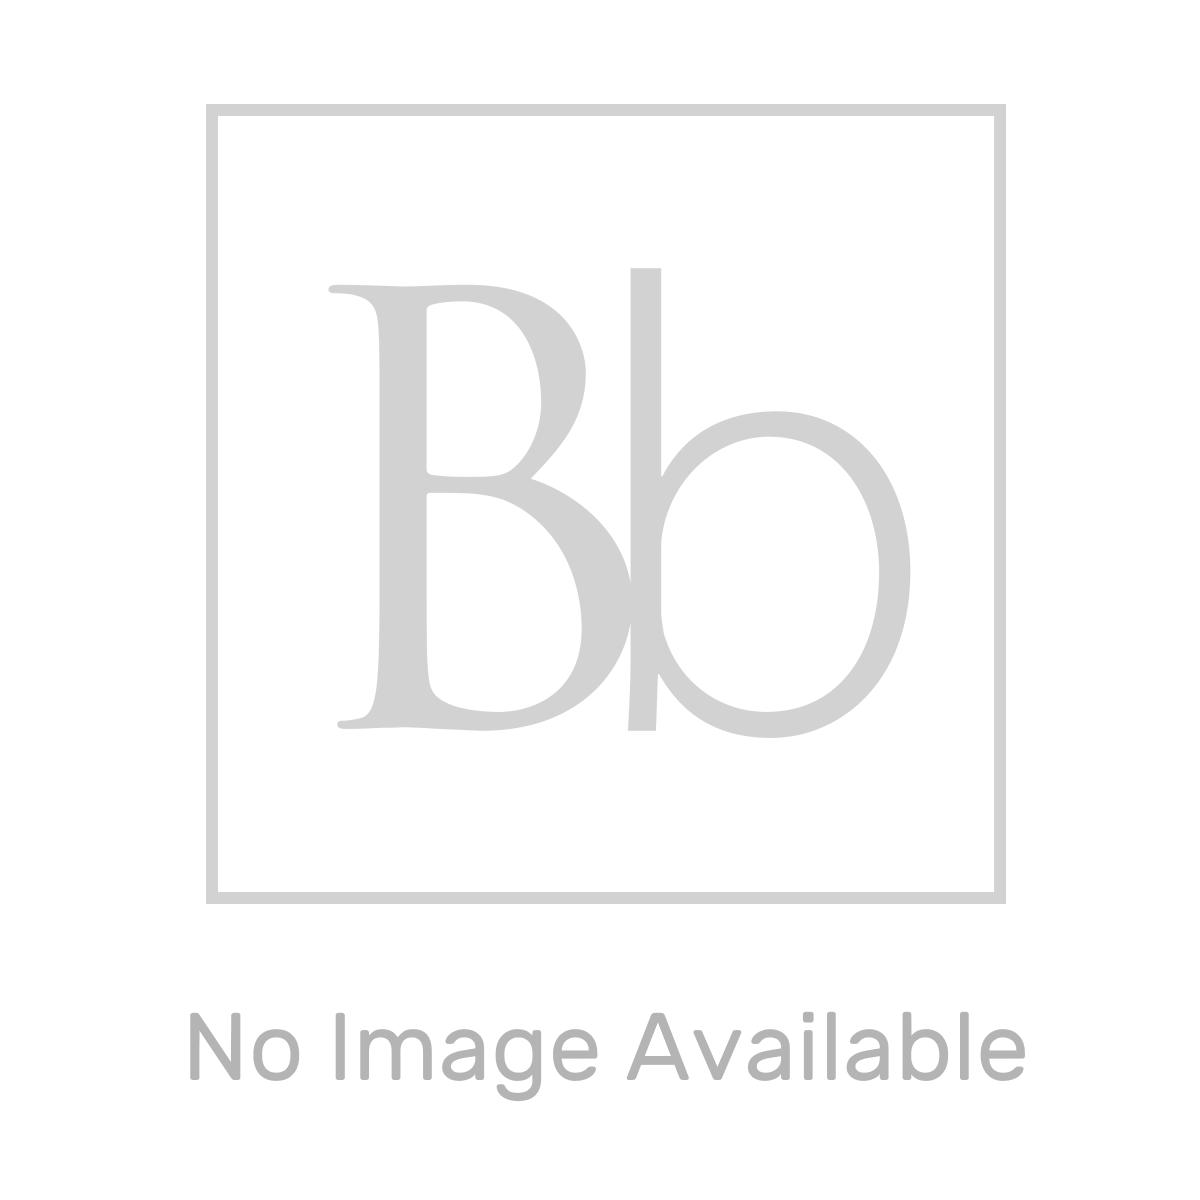 RAK Ecofix Chrome Flush Plate with Surrounded Round Push Buttons Measurements